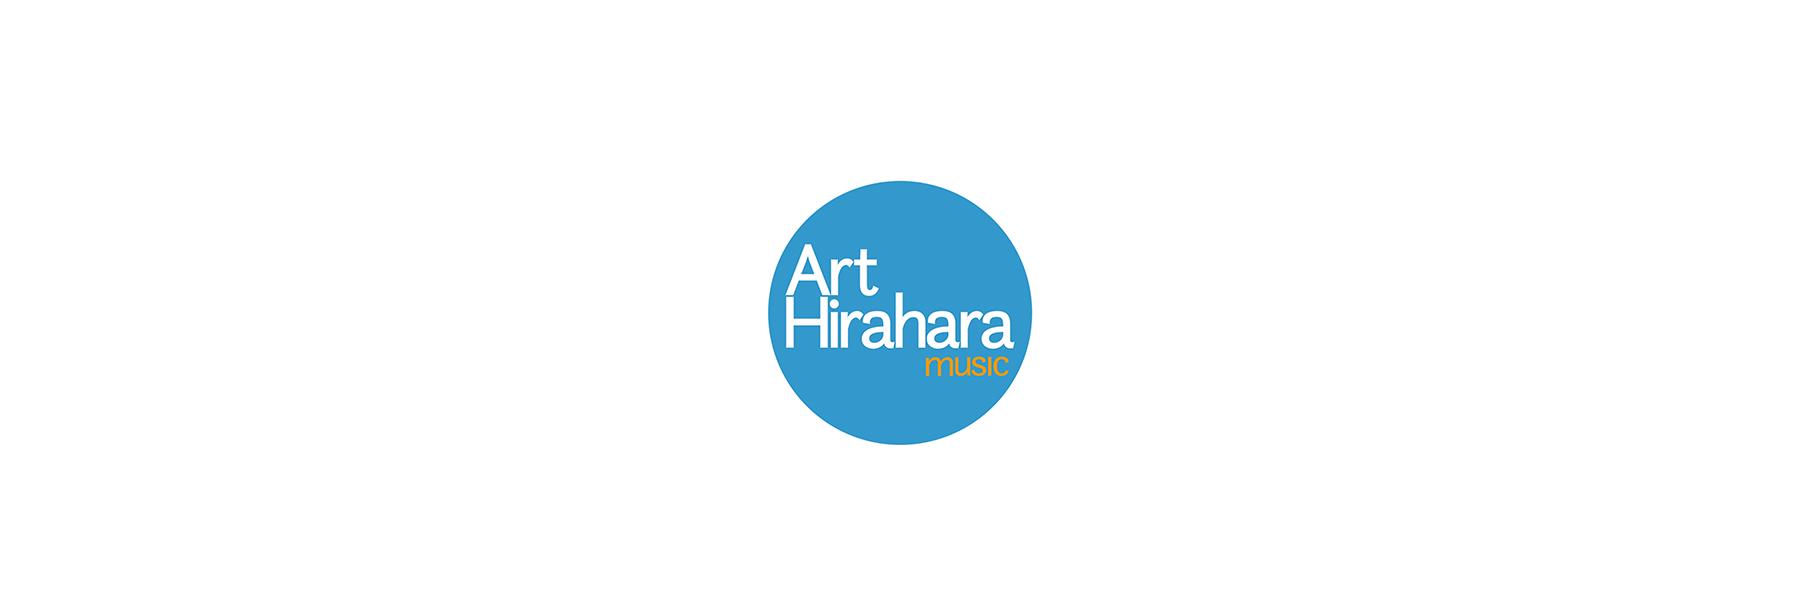 art hirahara logo